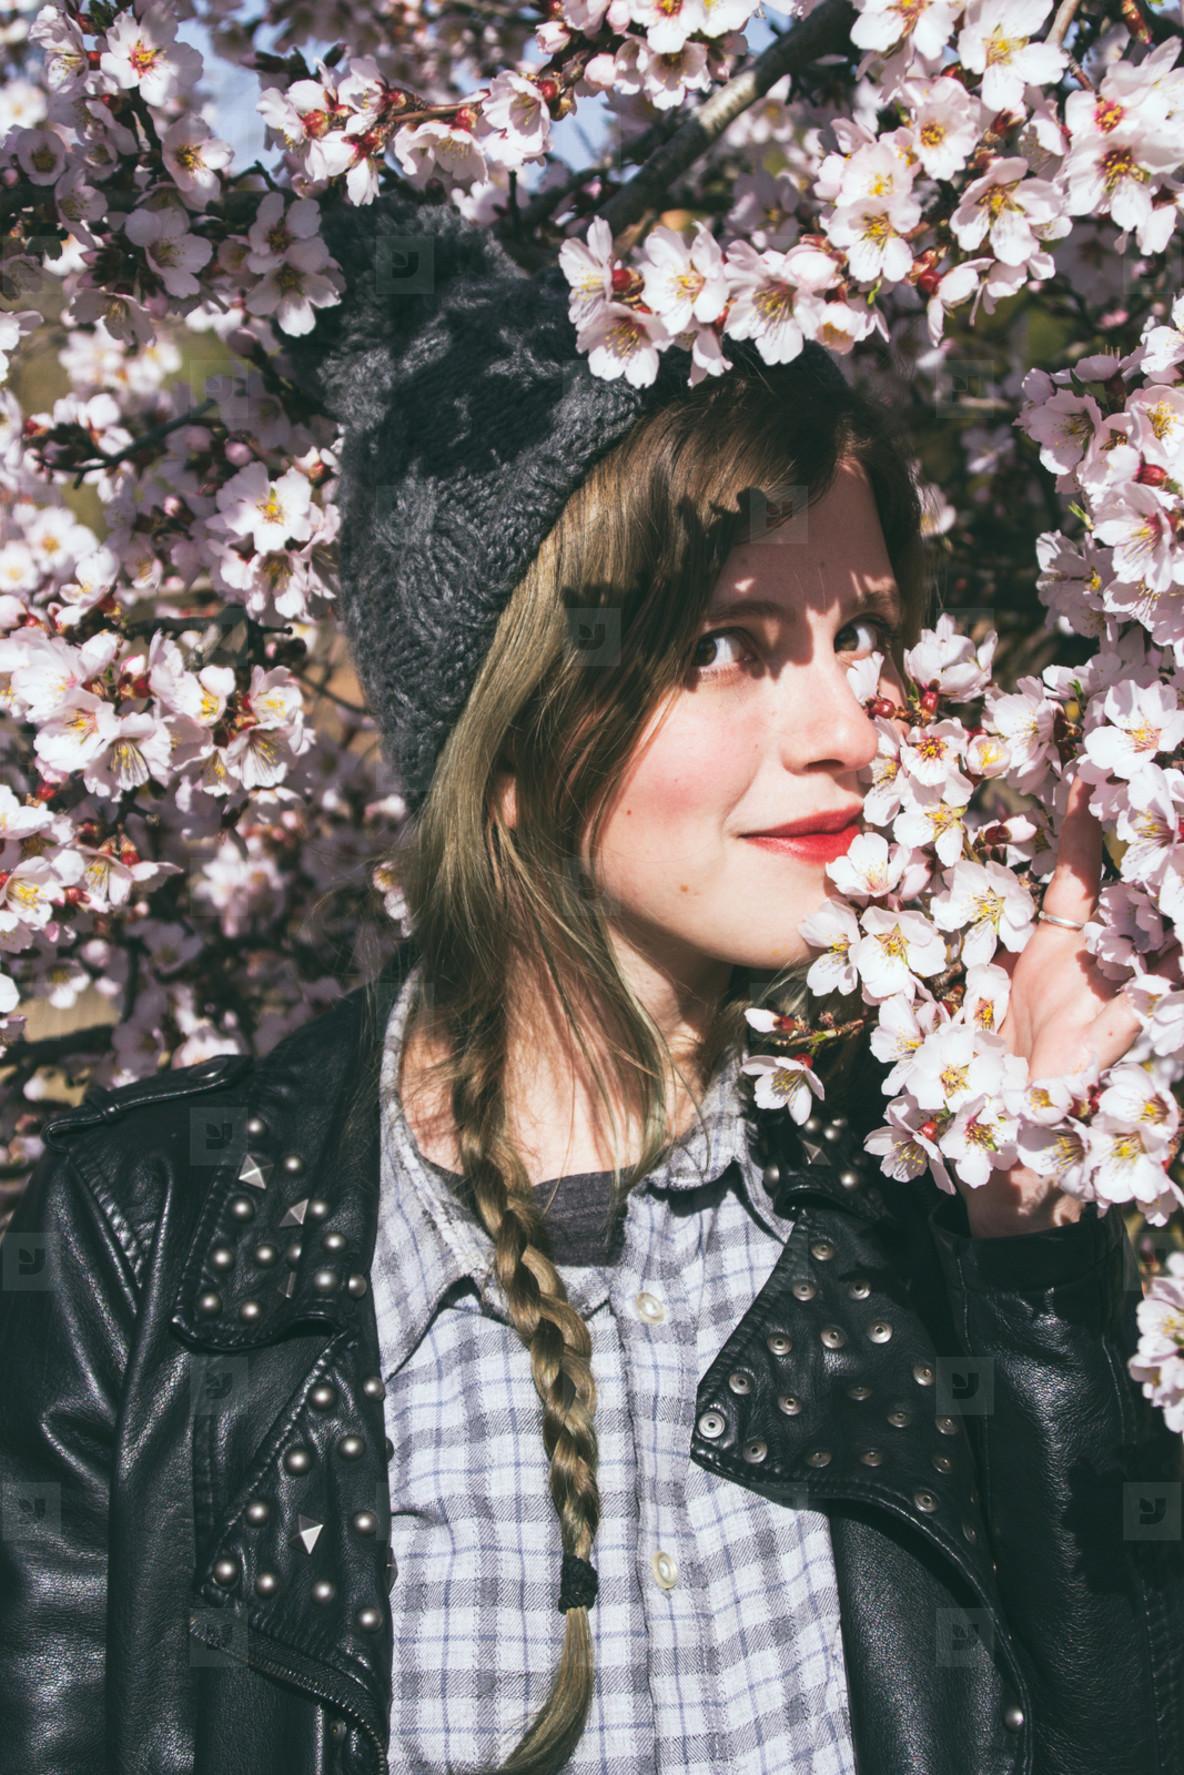 Young woman enjoying spring